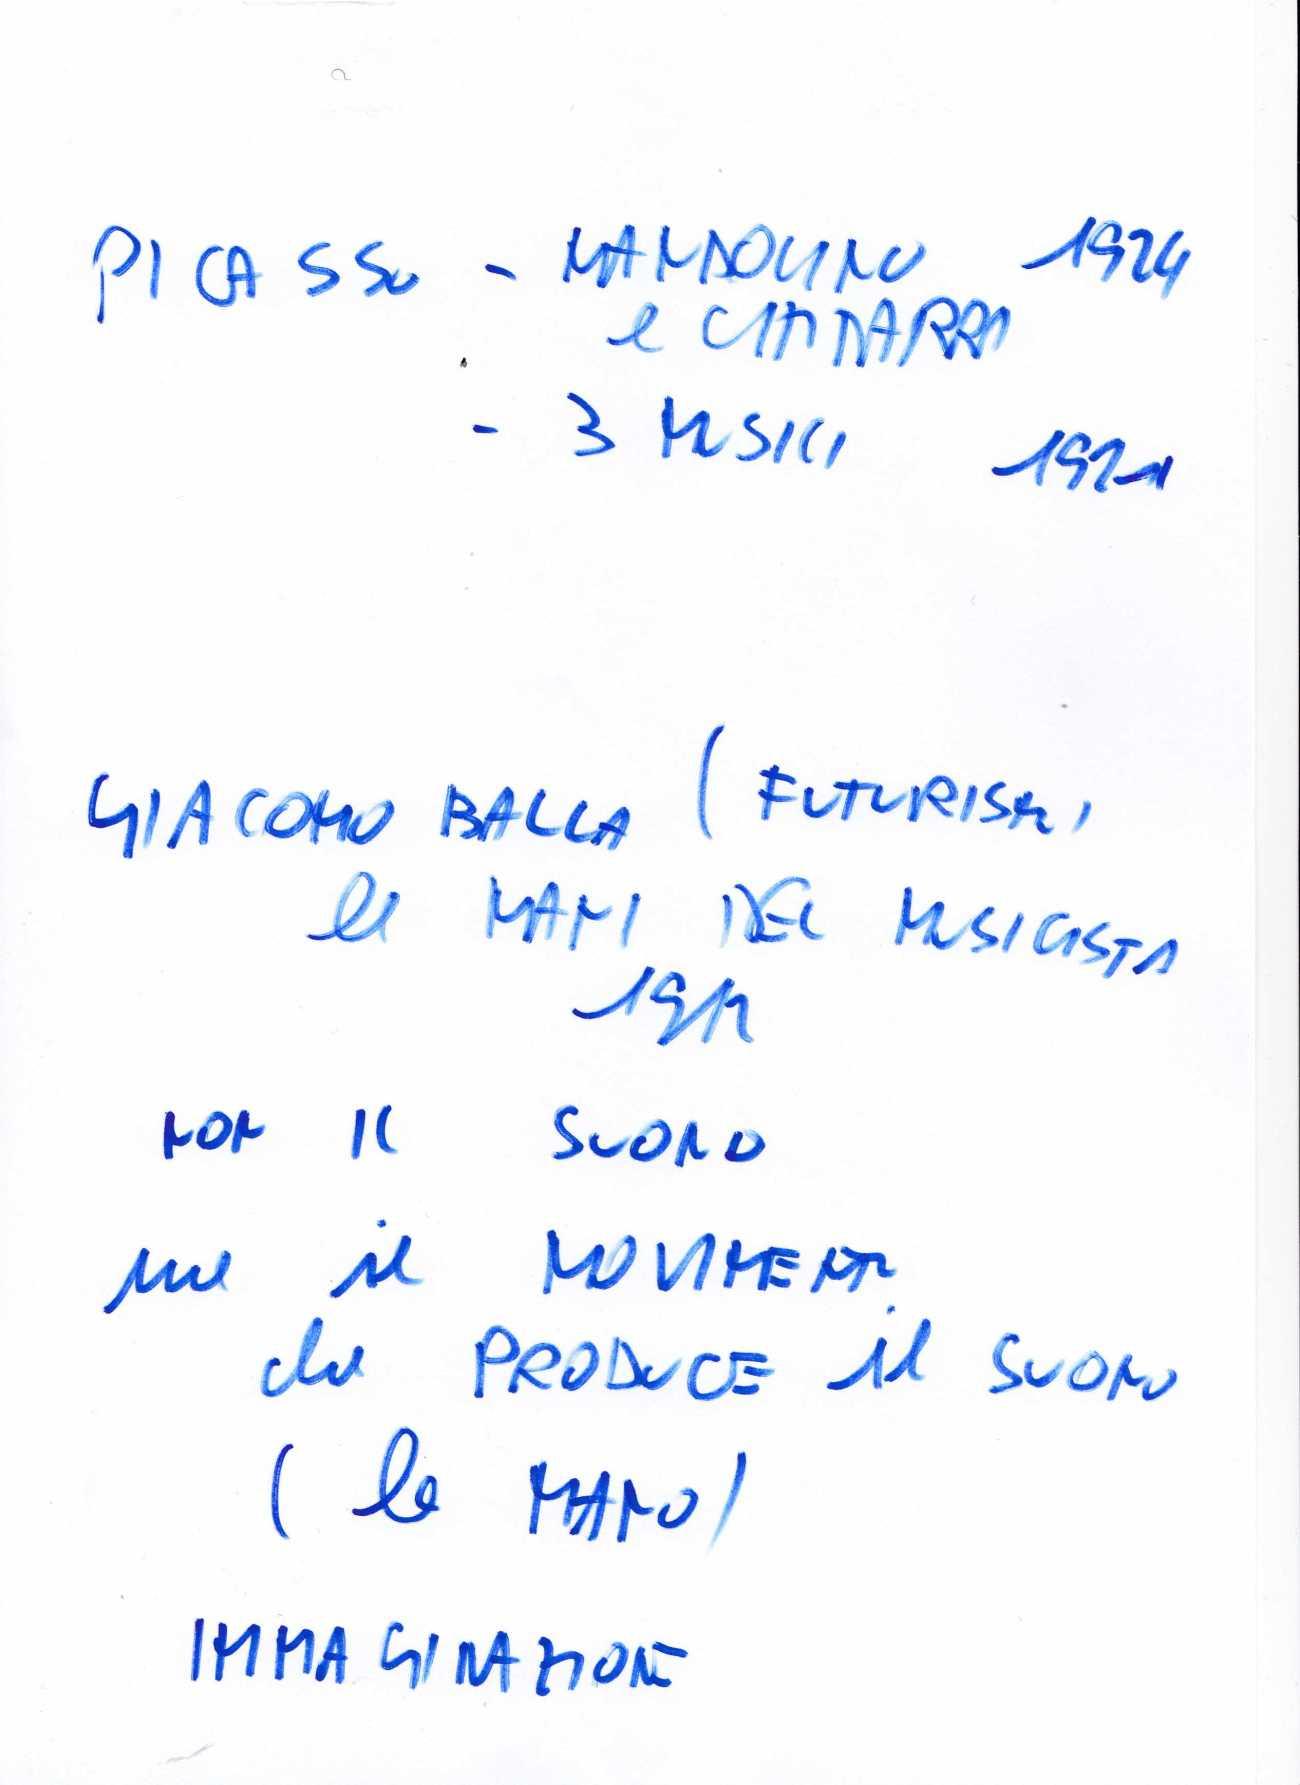 derosa536